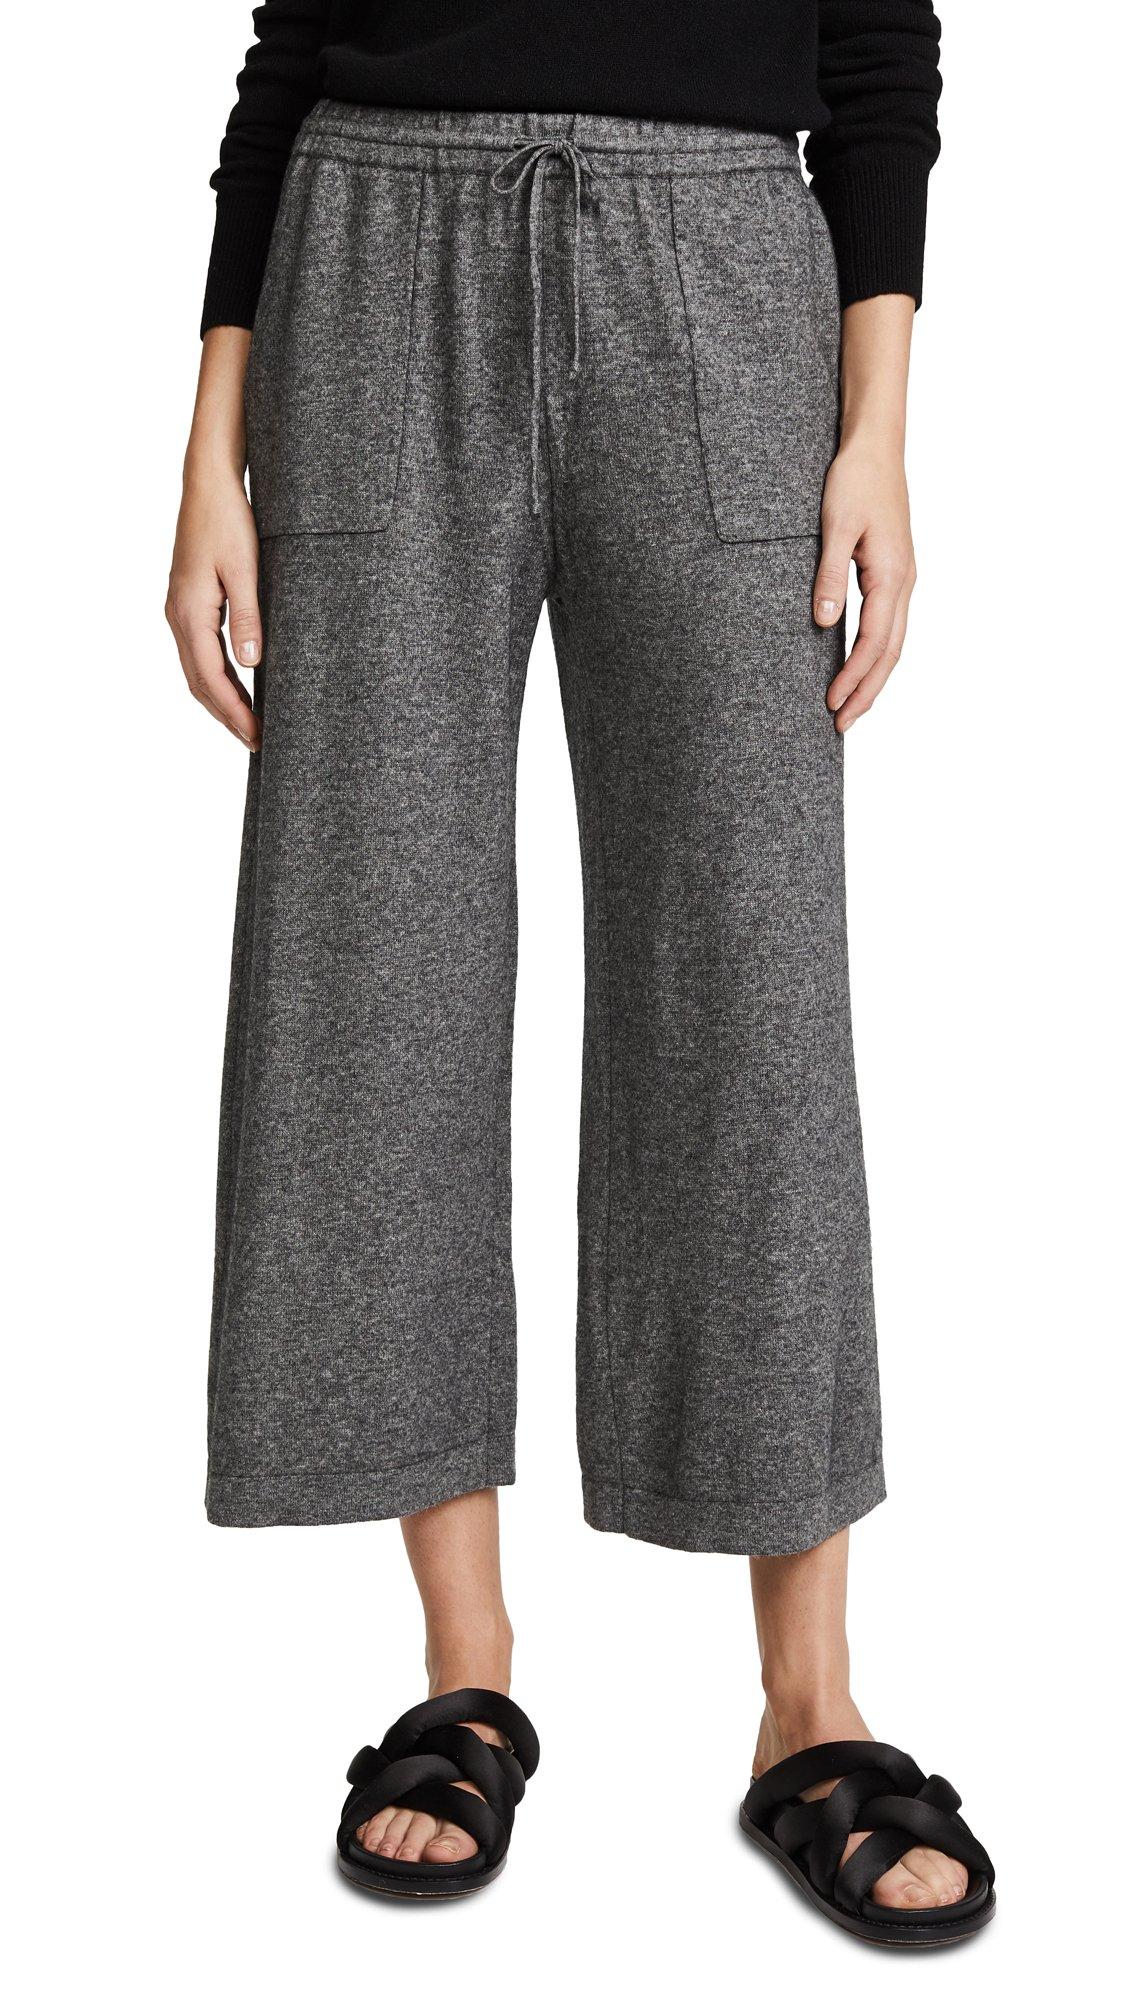 Vince Women's Wide Leg Crop Pants, Heather Stone, Small